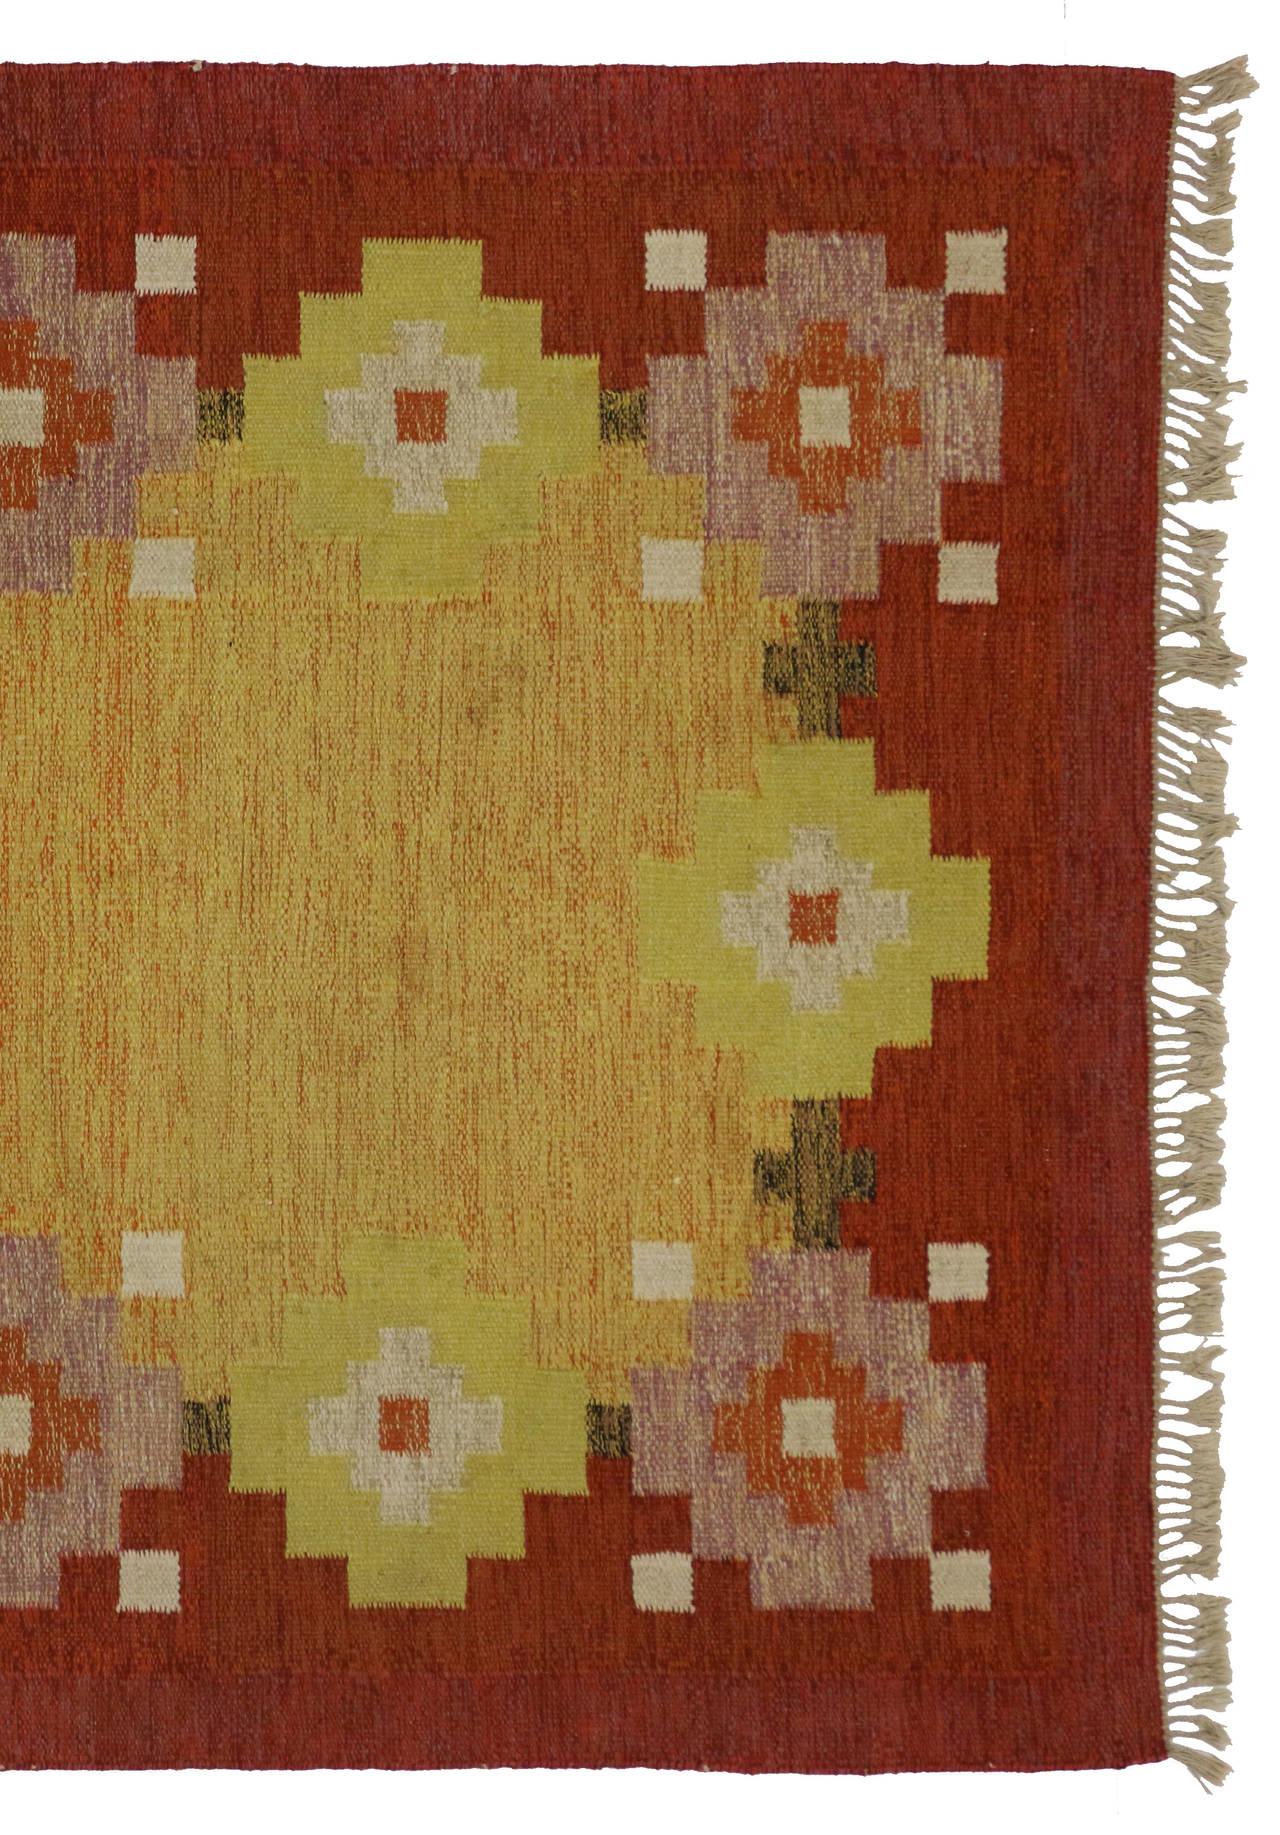 Scandinavian Modern Swedish Rollakan Kilim by Ida Rydelius, Flatweave Kilim Rug For Sale 5